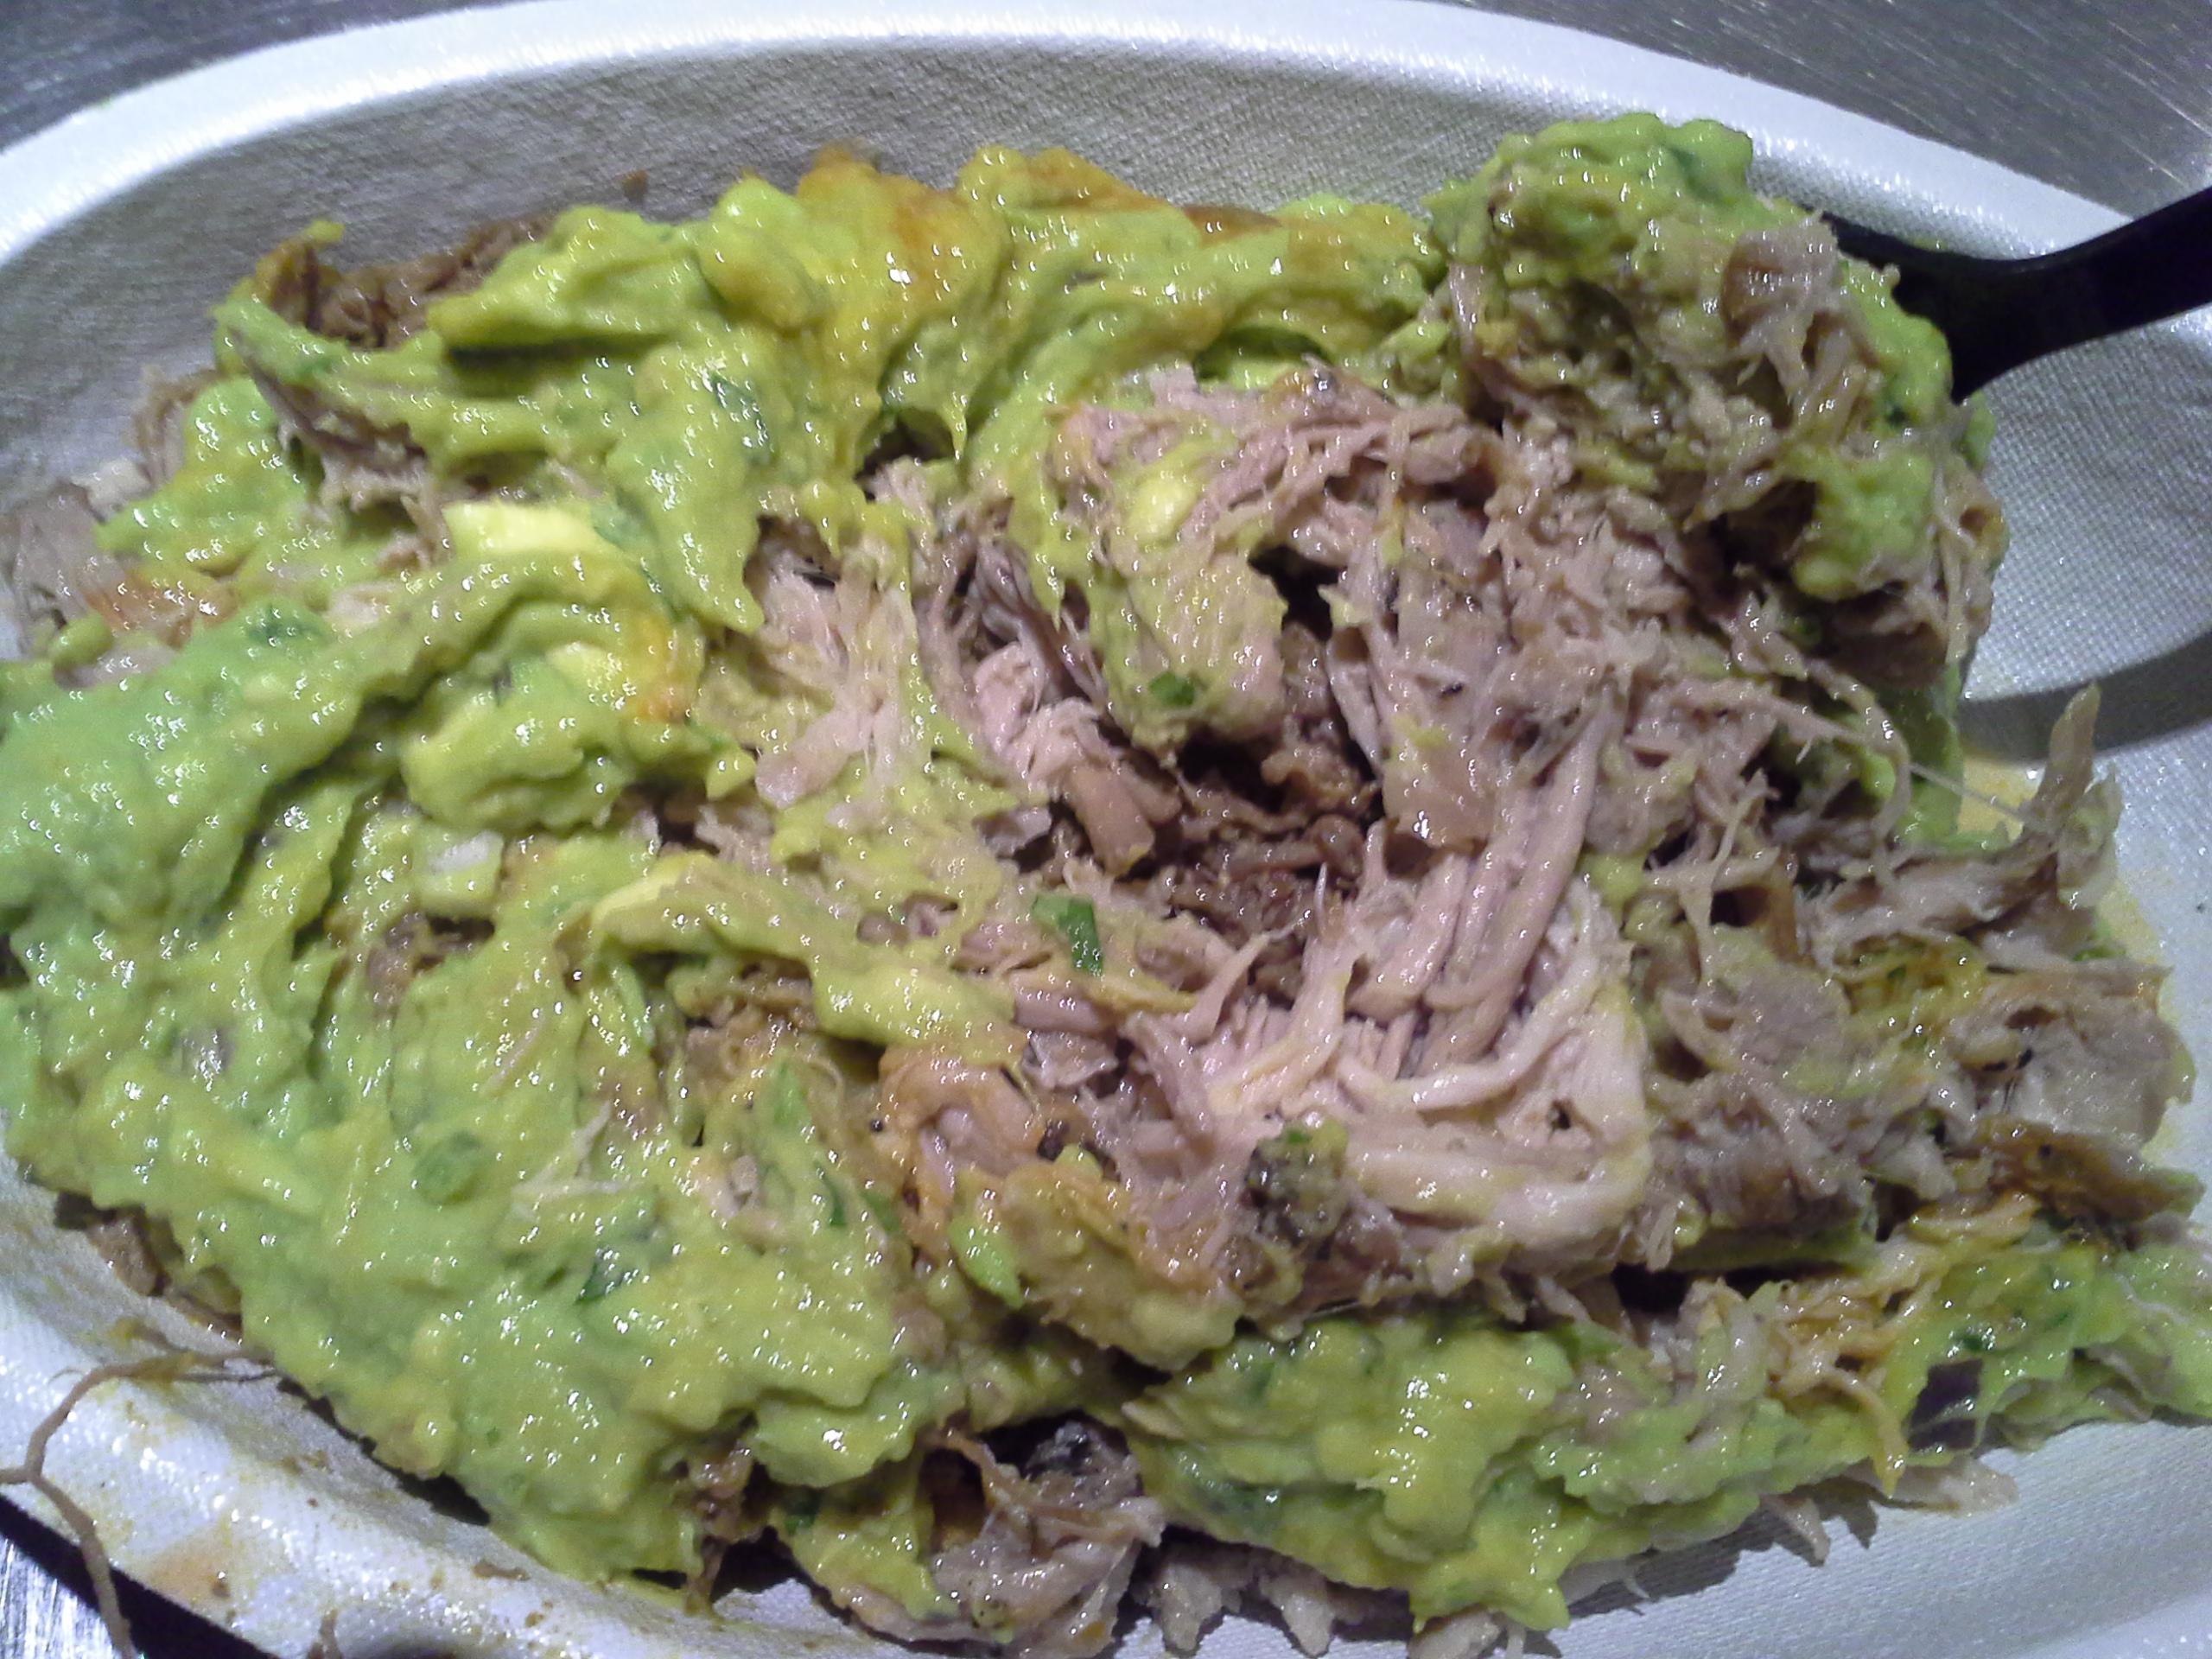 Dinner: 8:25 p.m.   Barbacoa, carnitas, guacamole, Tabasco from Chipotle